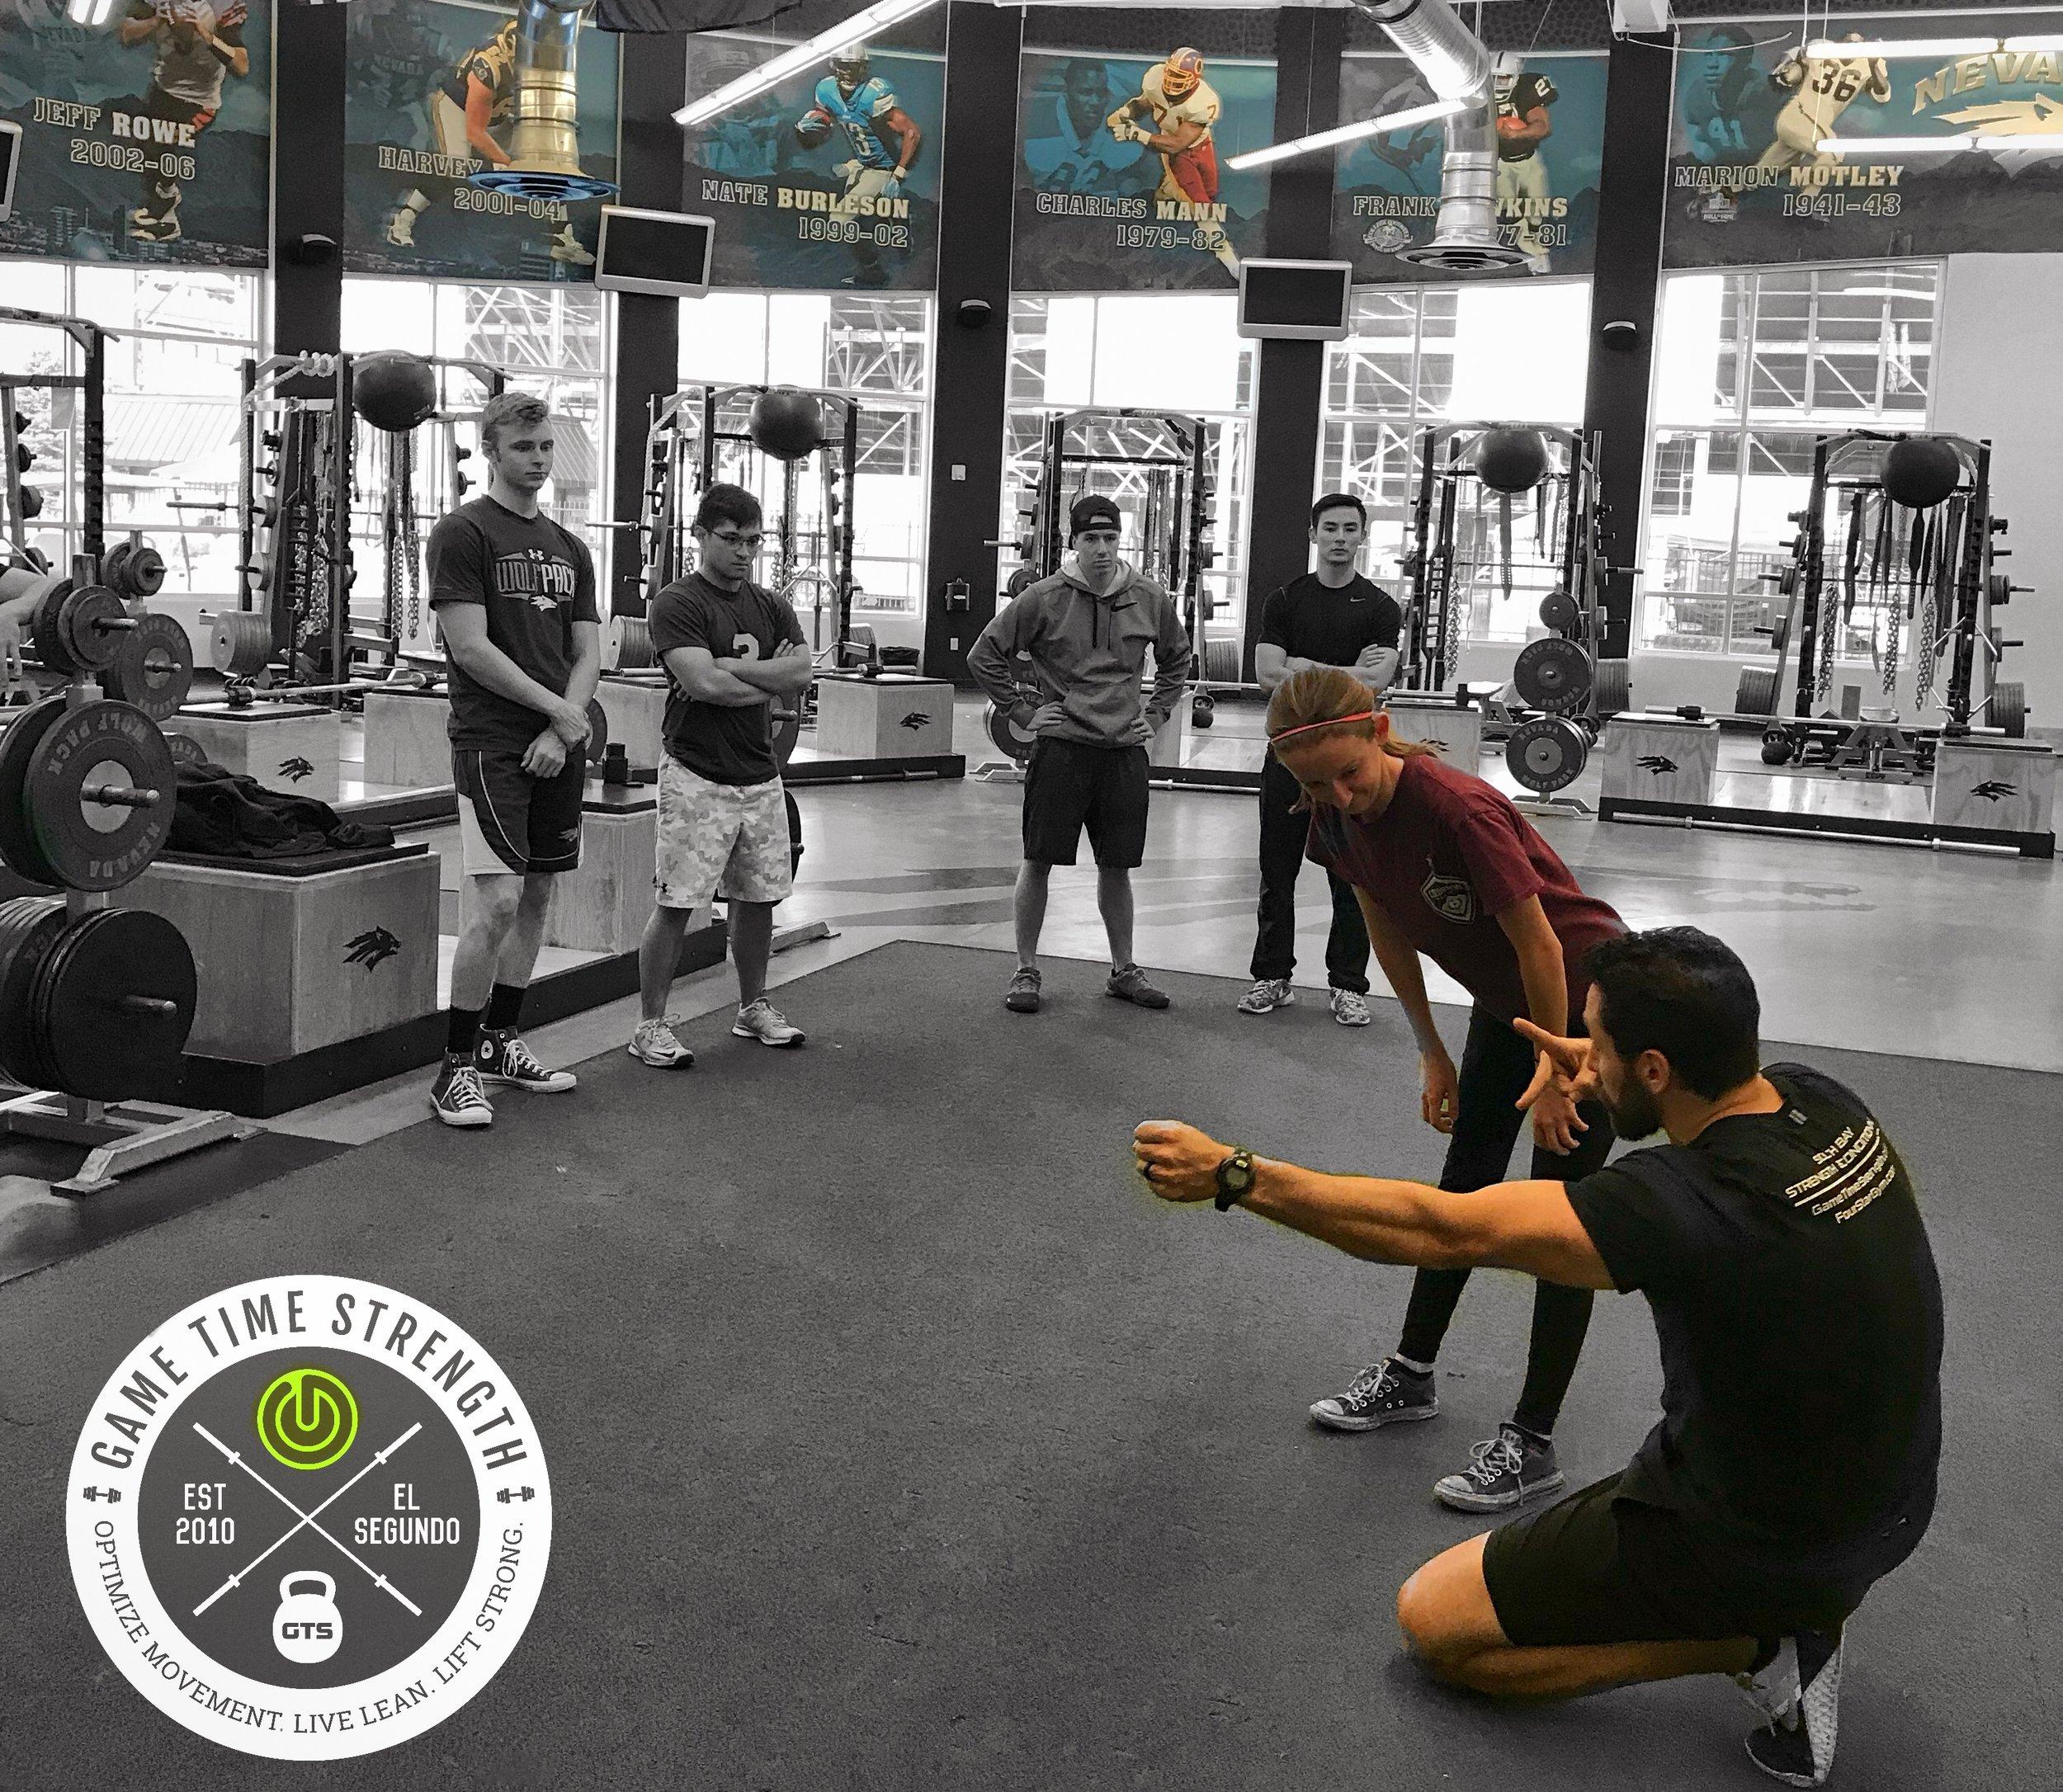 workshop - Barbell strength squat bench deadlift press row pull - El Segundo Game Time Strength Los Angeles Seminar Training.JPG